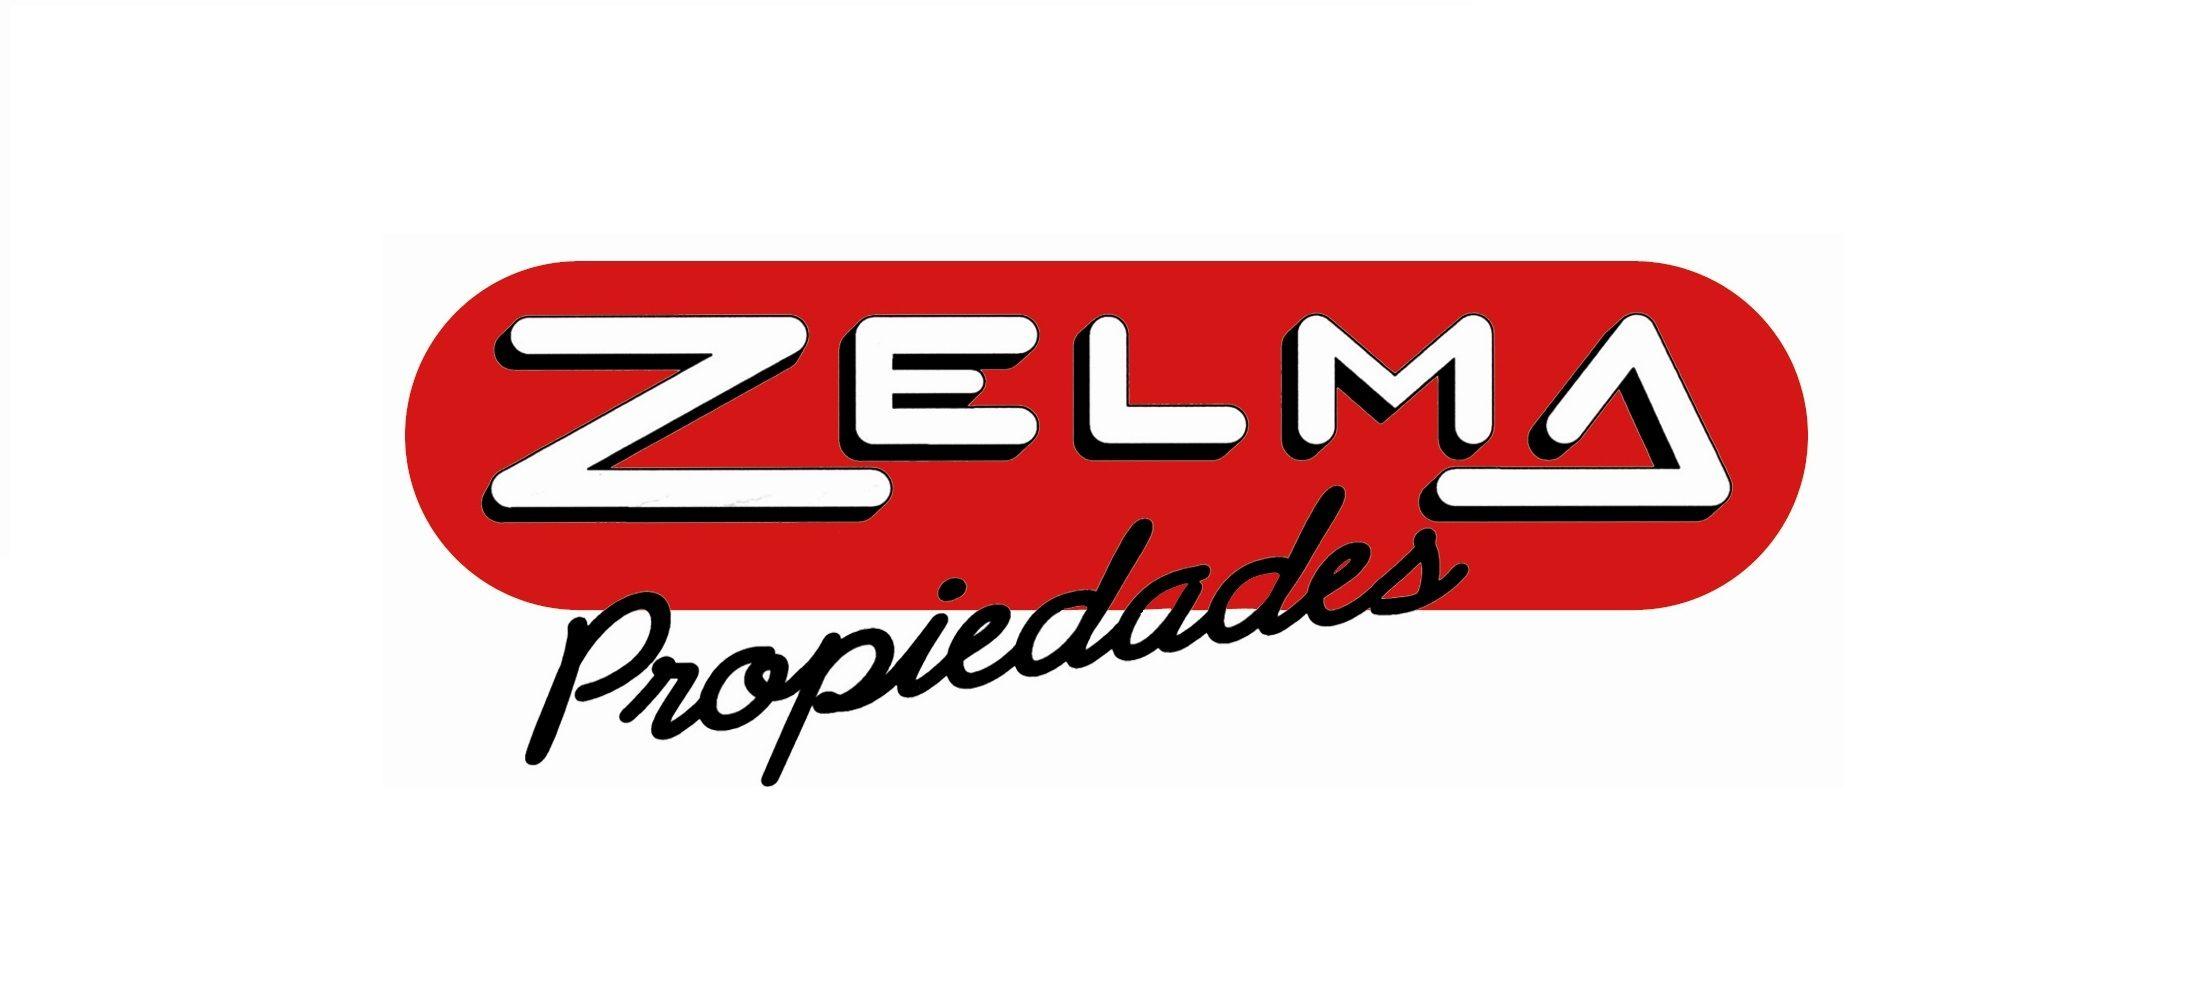 Logo de  Zelma Propiedades